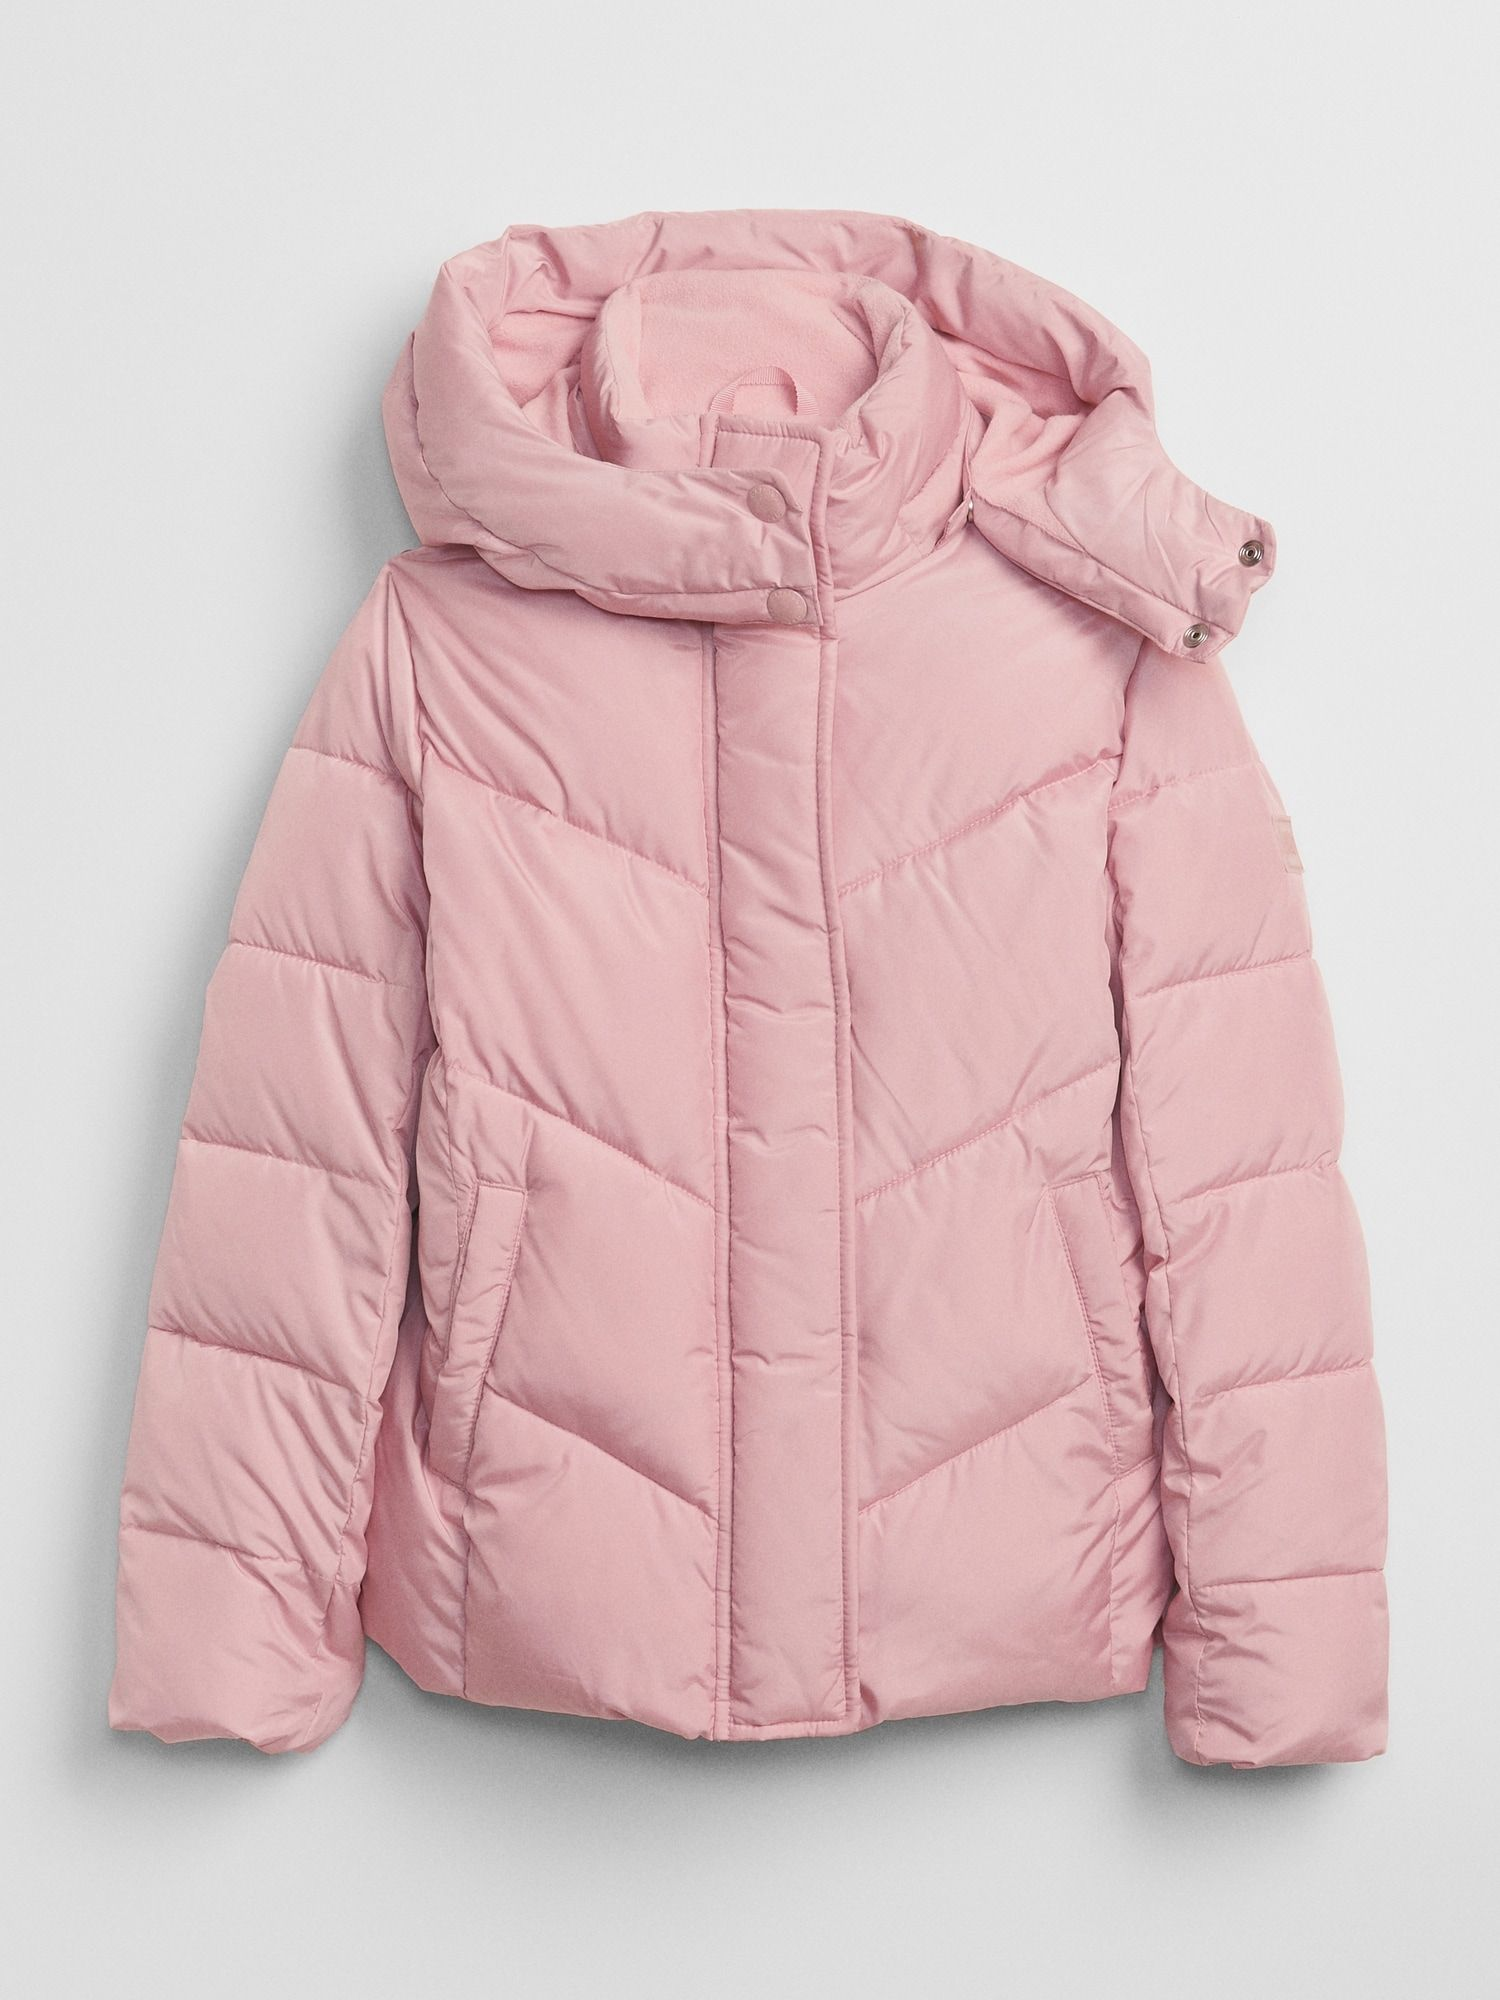 Product Photo Little Girl Closet Jackets Puffer Jackets [ 2000 x 1500 Pixel ]